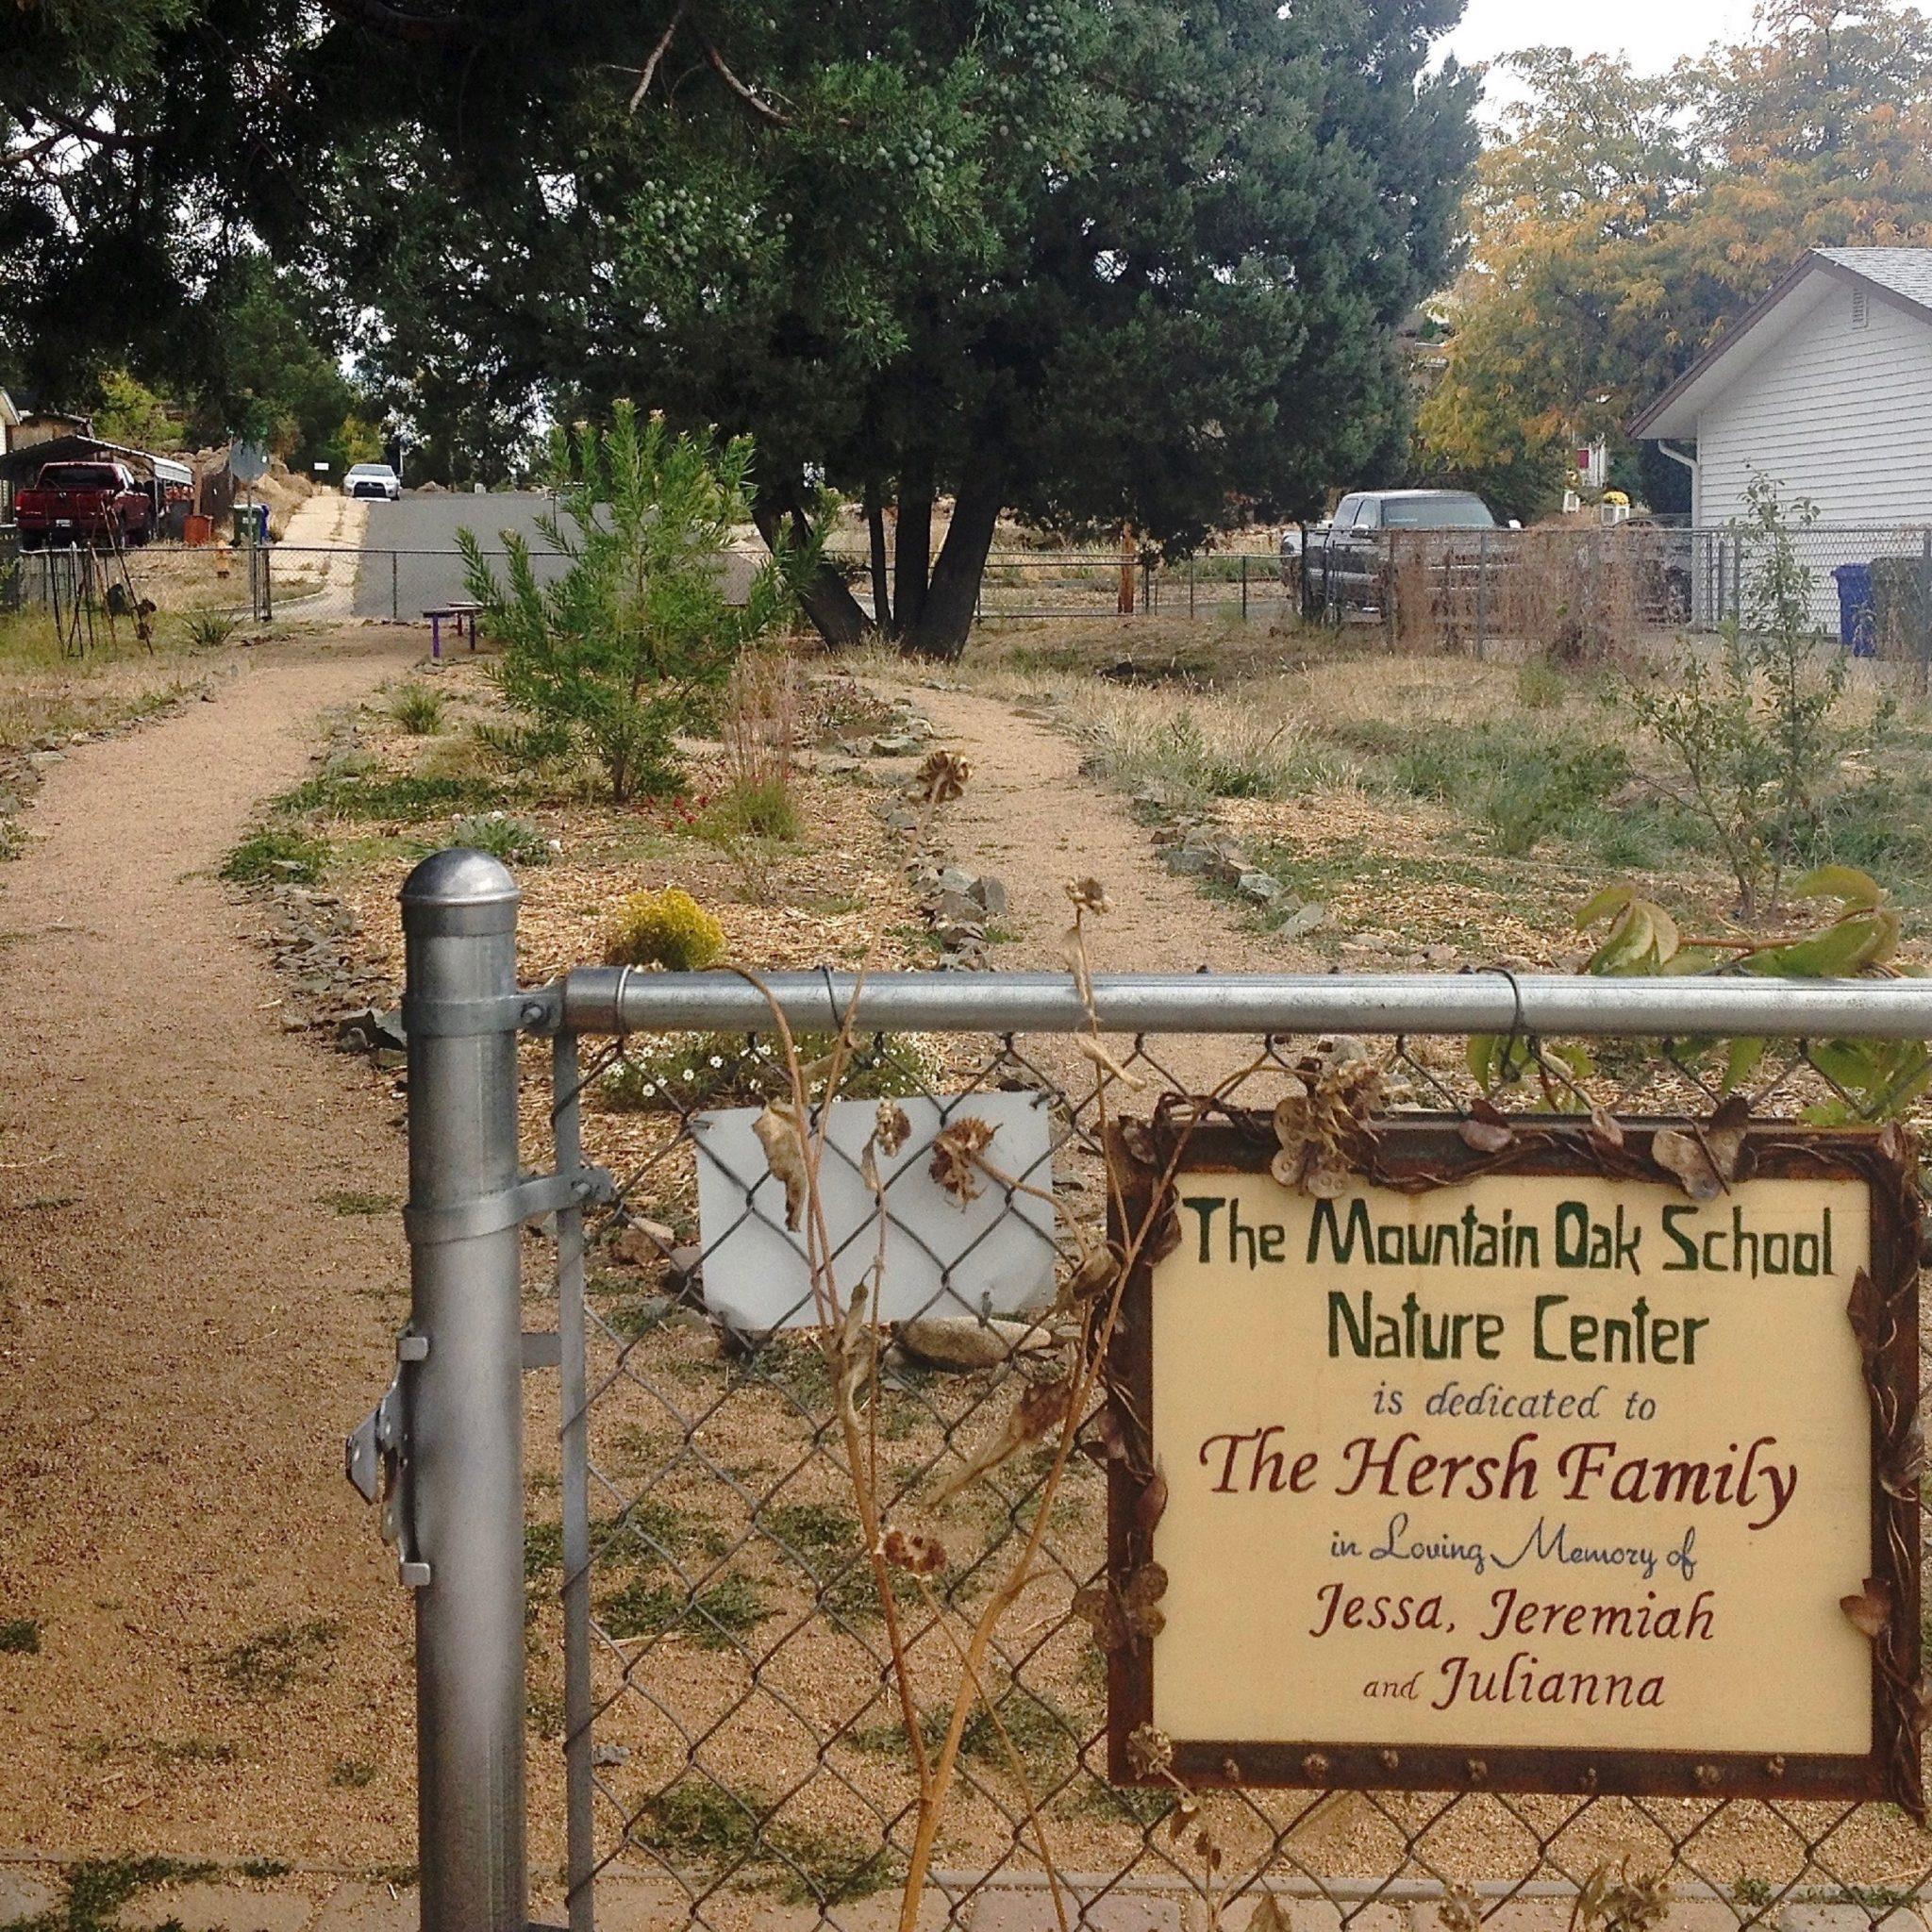 Schoolyard Habitat Program   The Highlands Center for Natural History